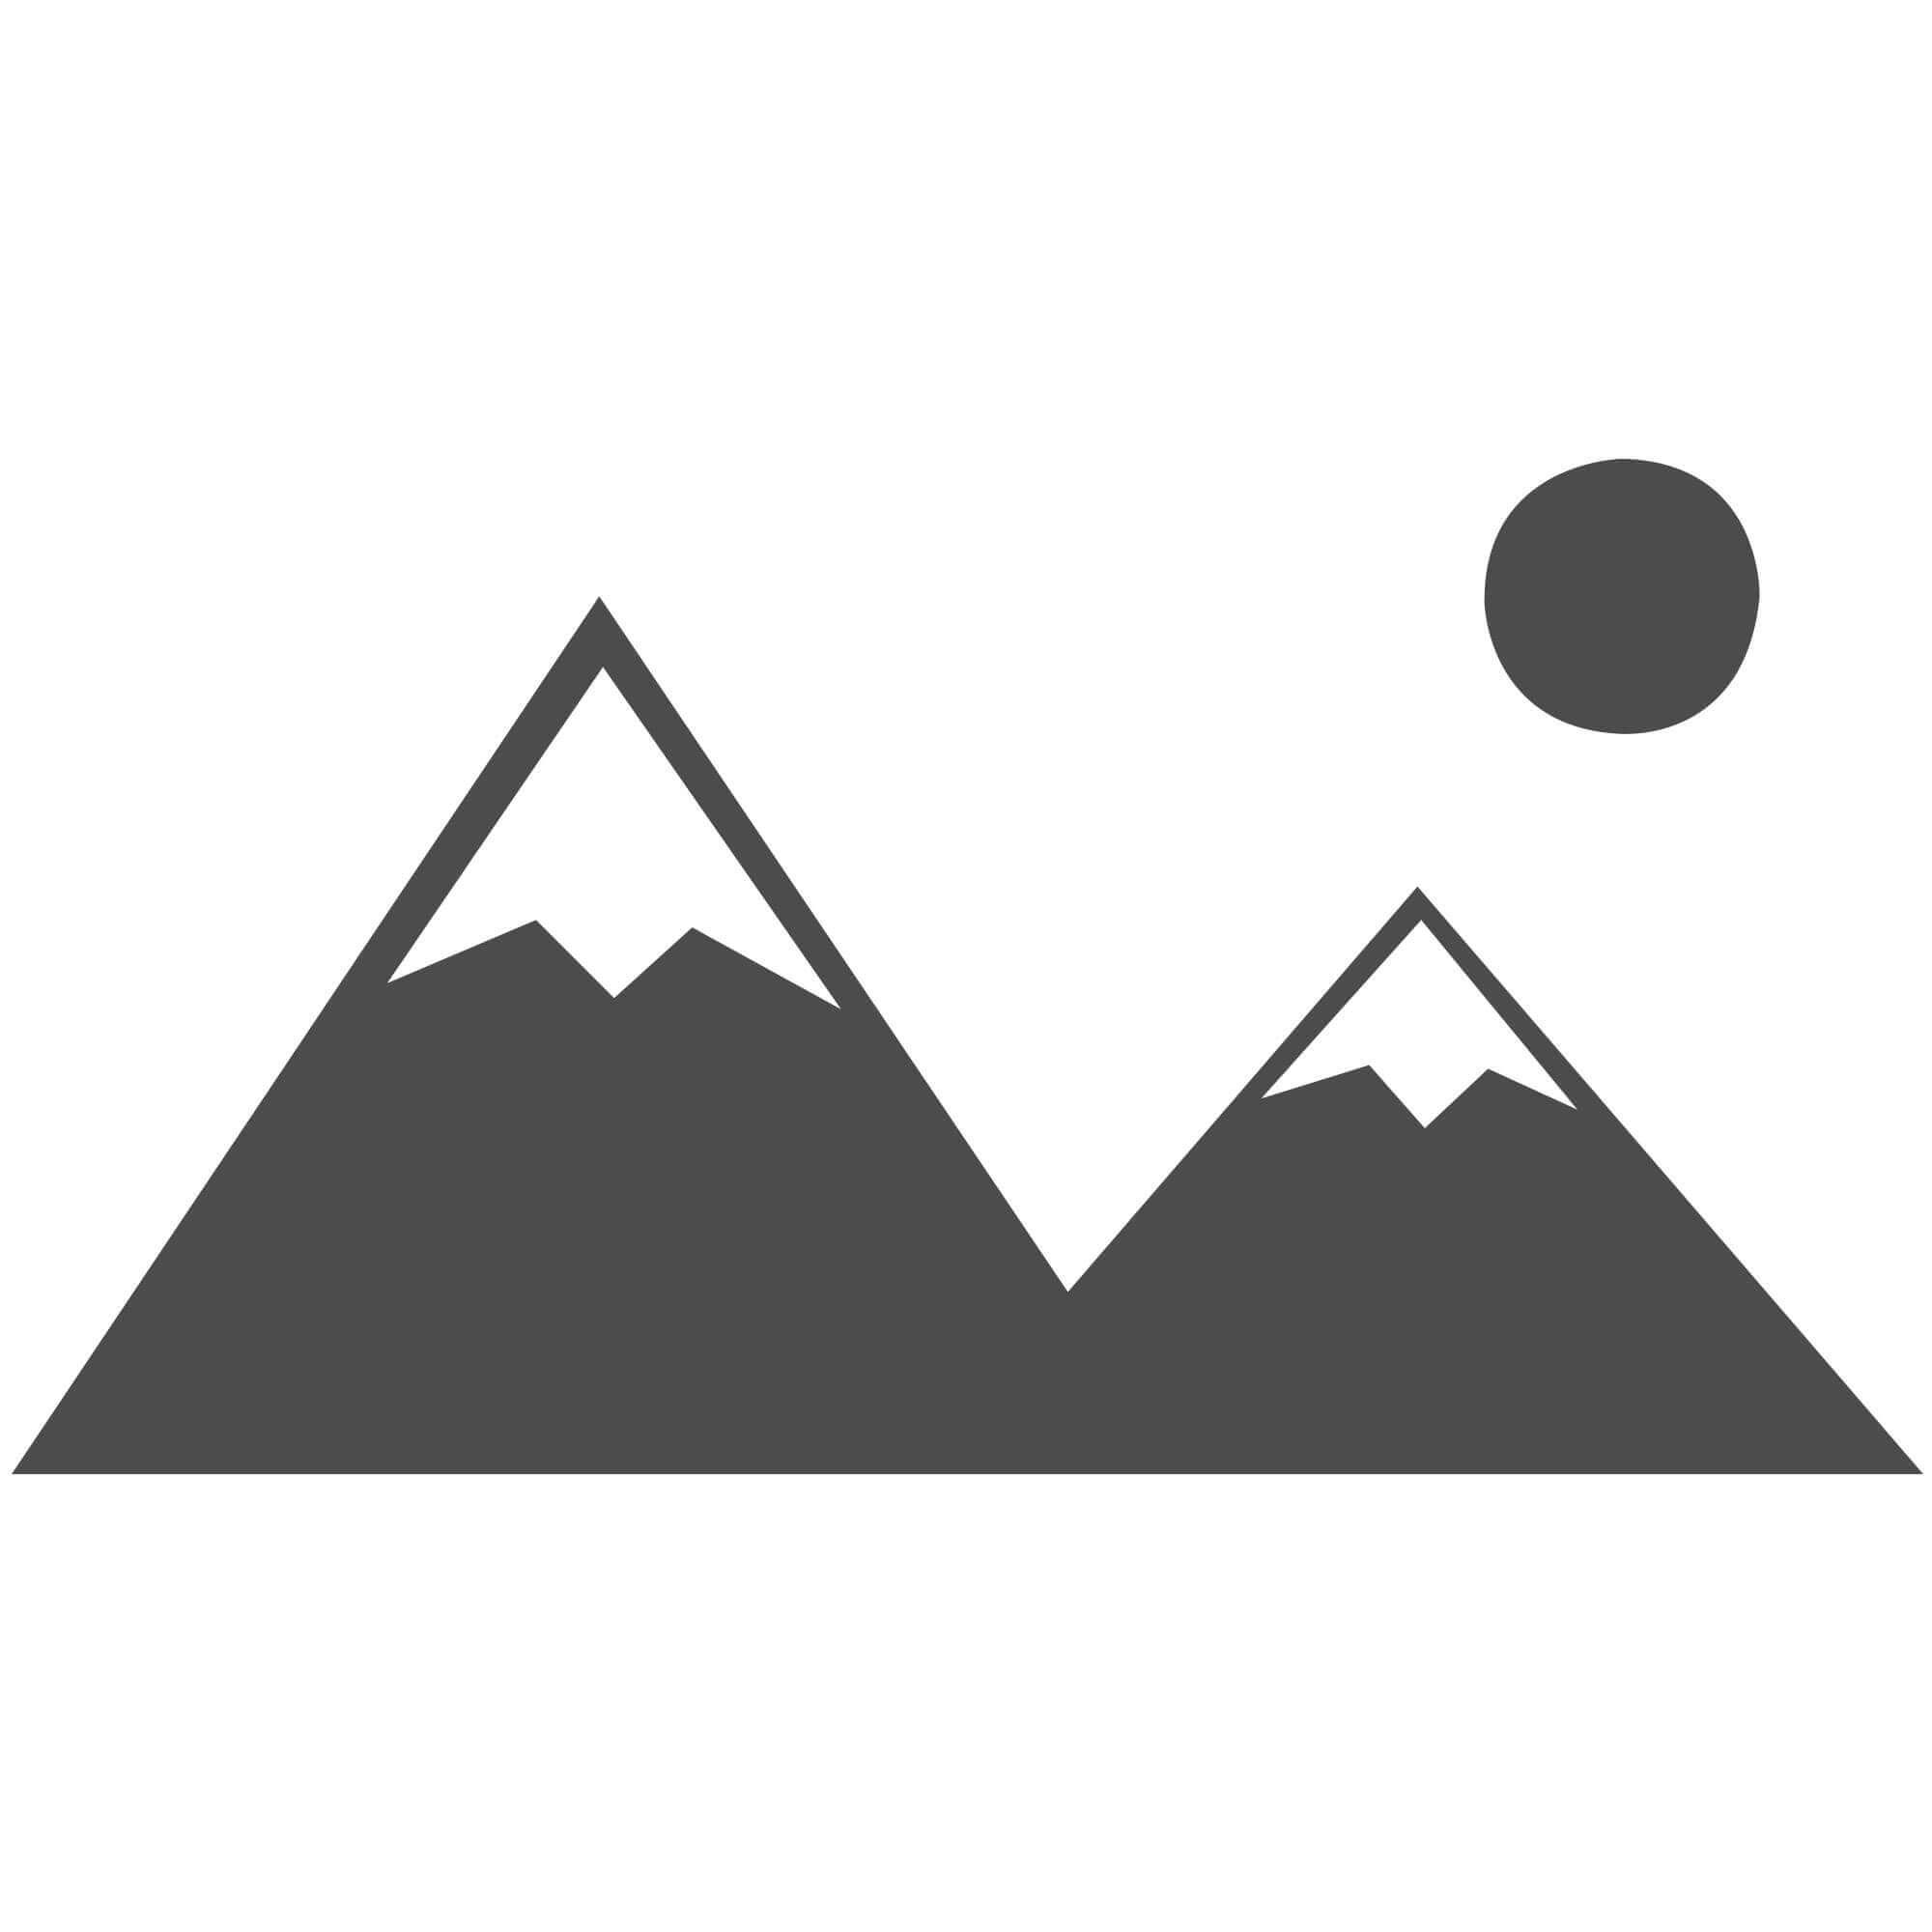 "Velvet Droplet Rug - Black Grey - Size 160 x 230 cm (5'3"" x 7'7"")"